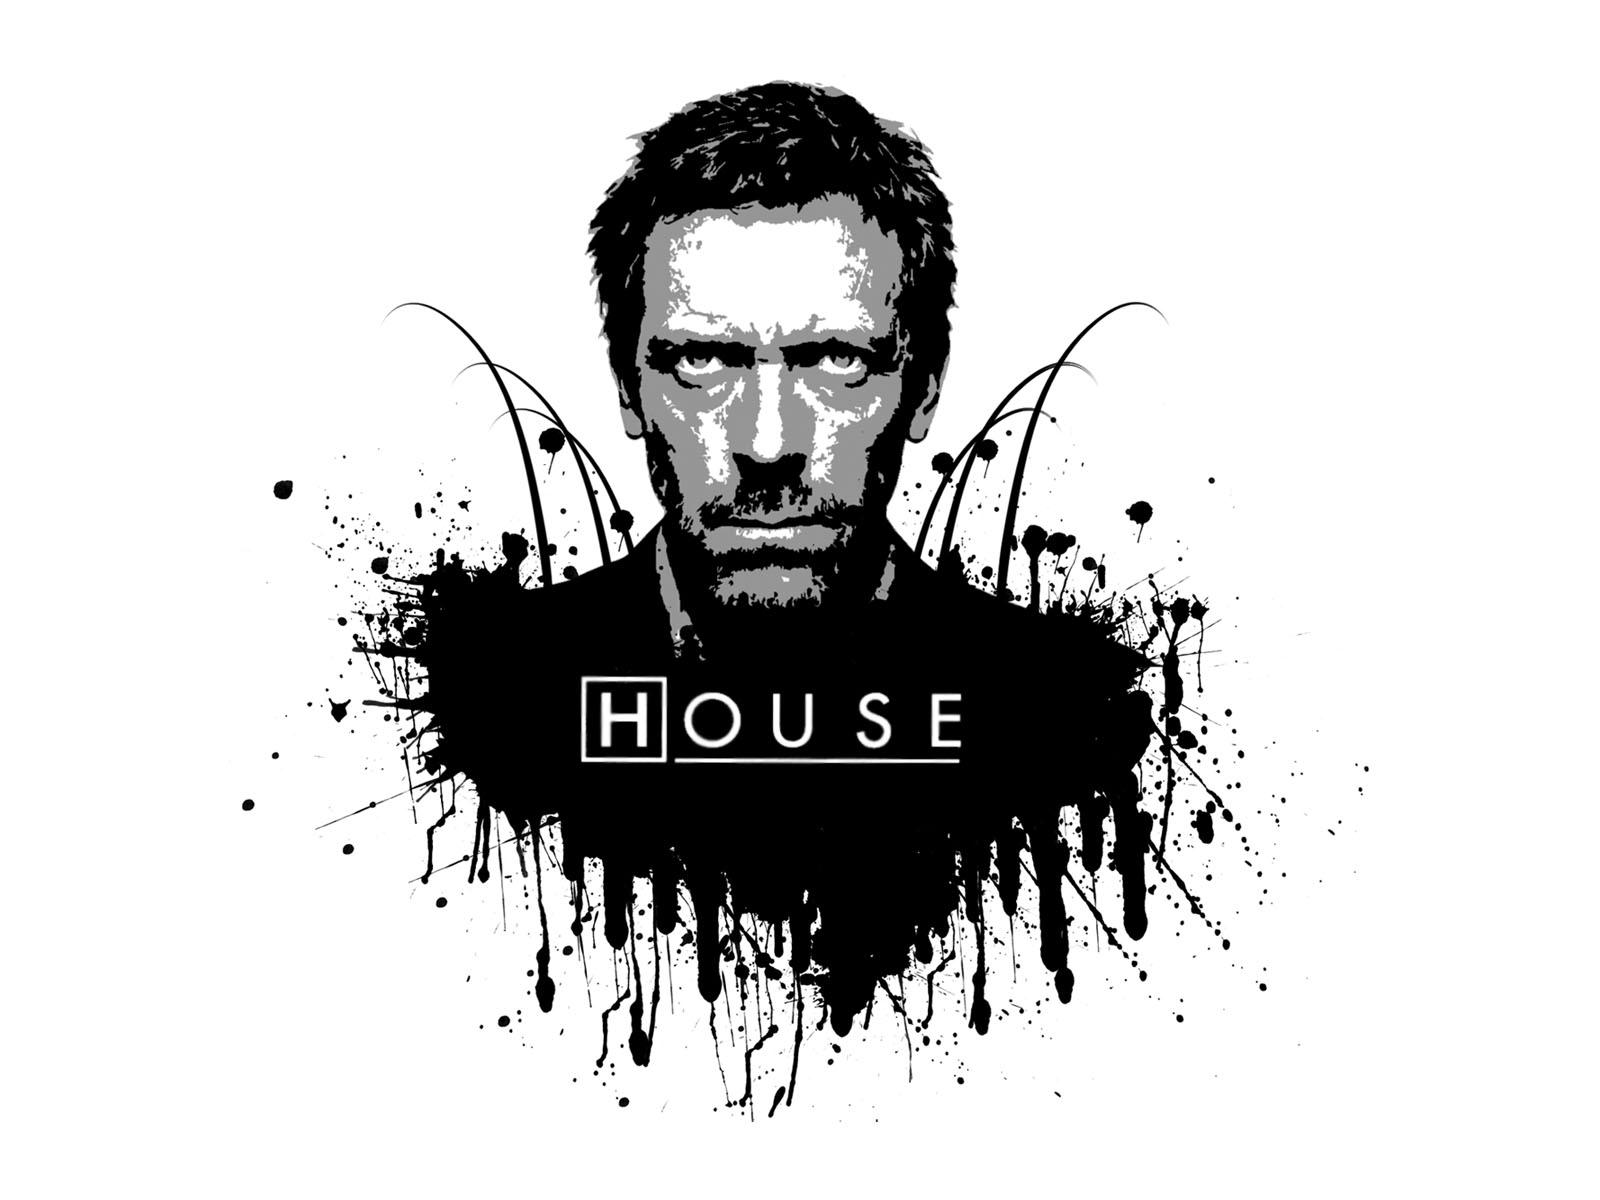 Dr House wallpaper 1